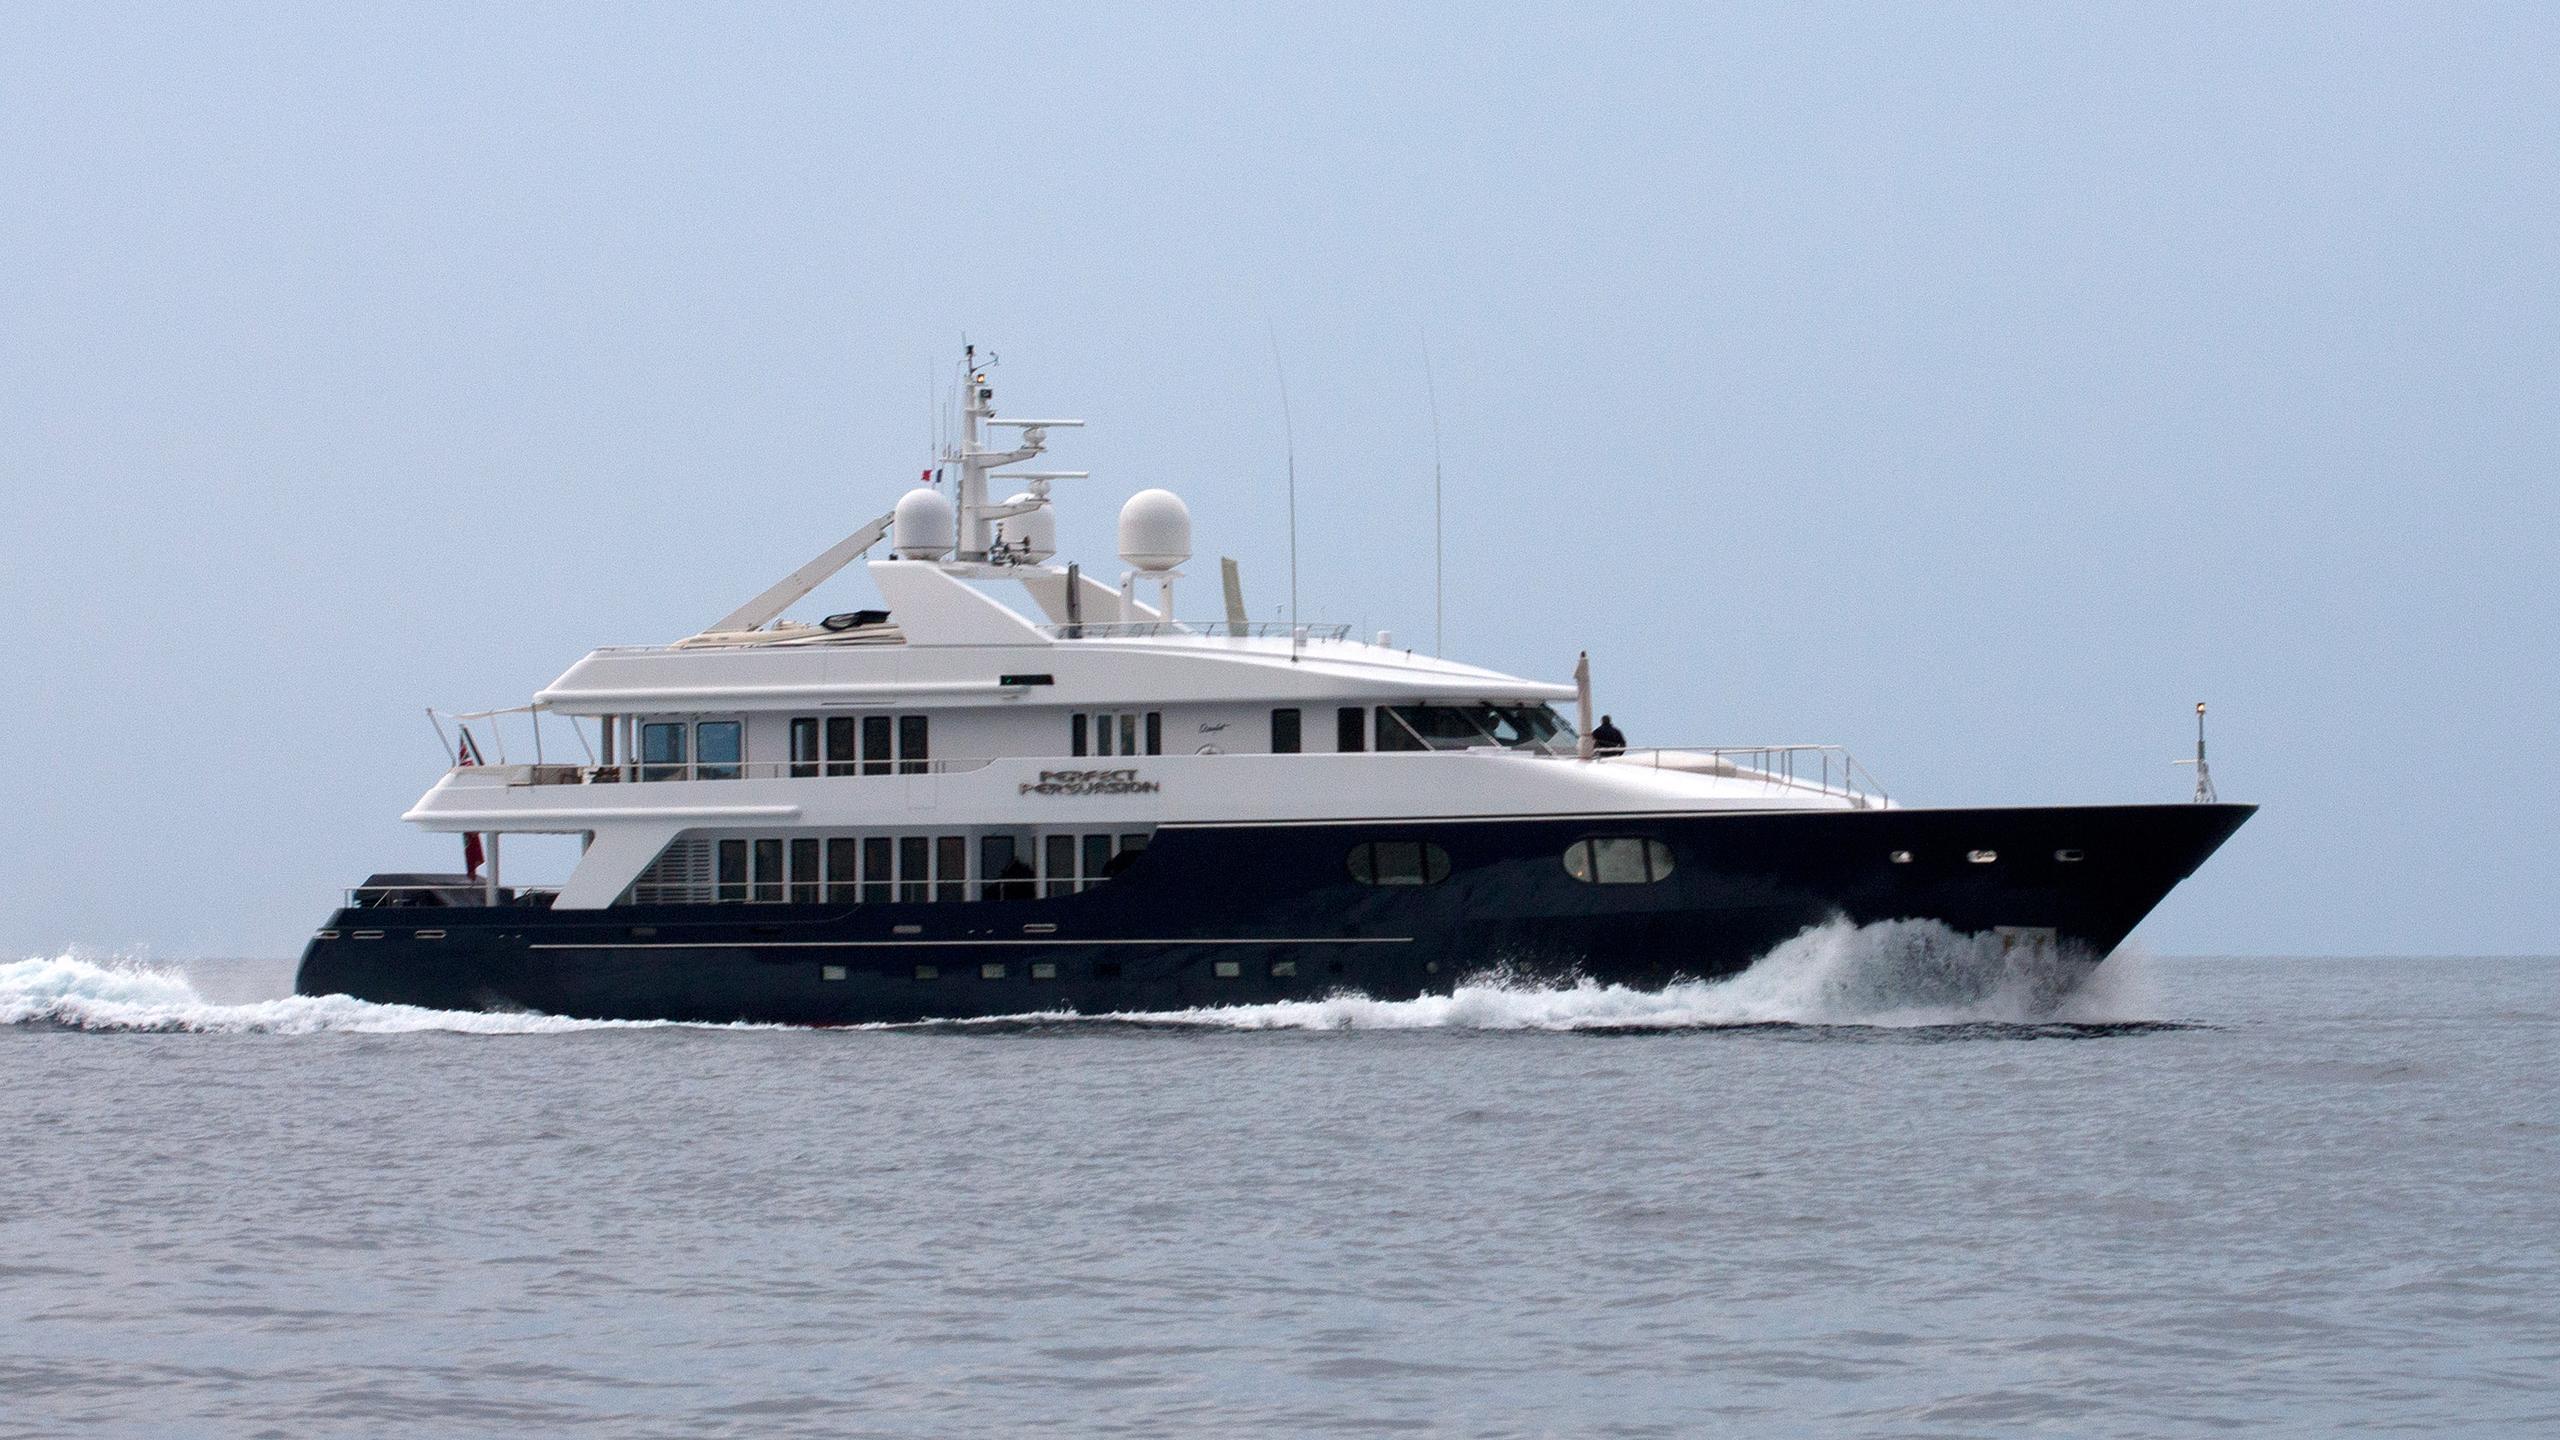 perfect-persuasion-motor-yacht-oceanfast-1997-46m-profile